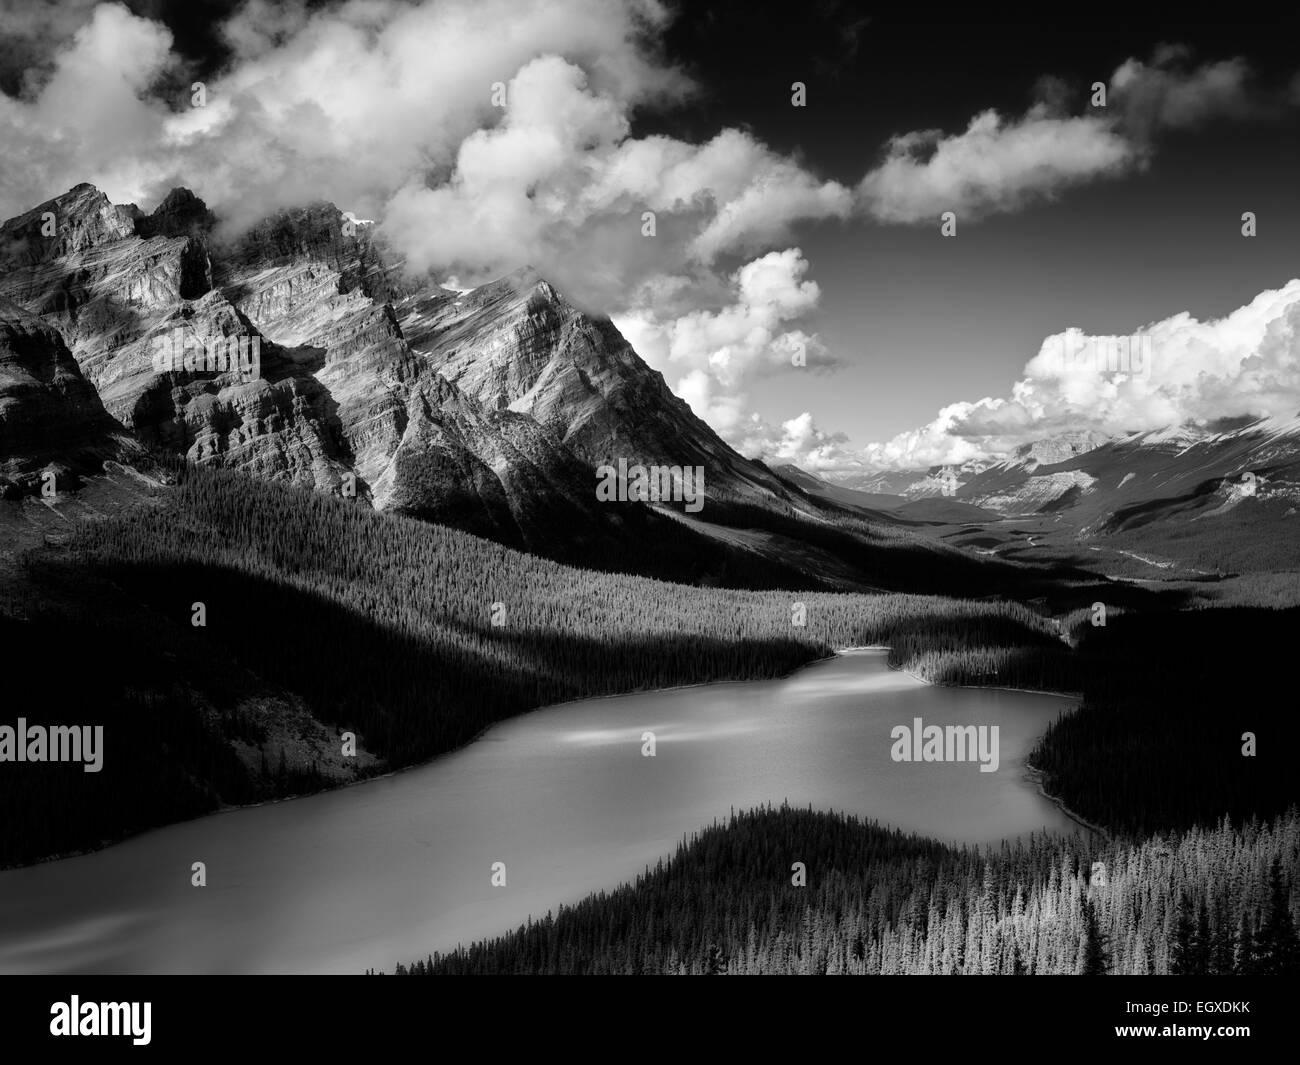 Le lac Peyto. Le parc national Banff. L'Alberta. Le Canada. Photo Stock